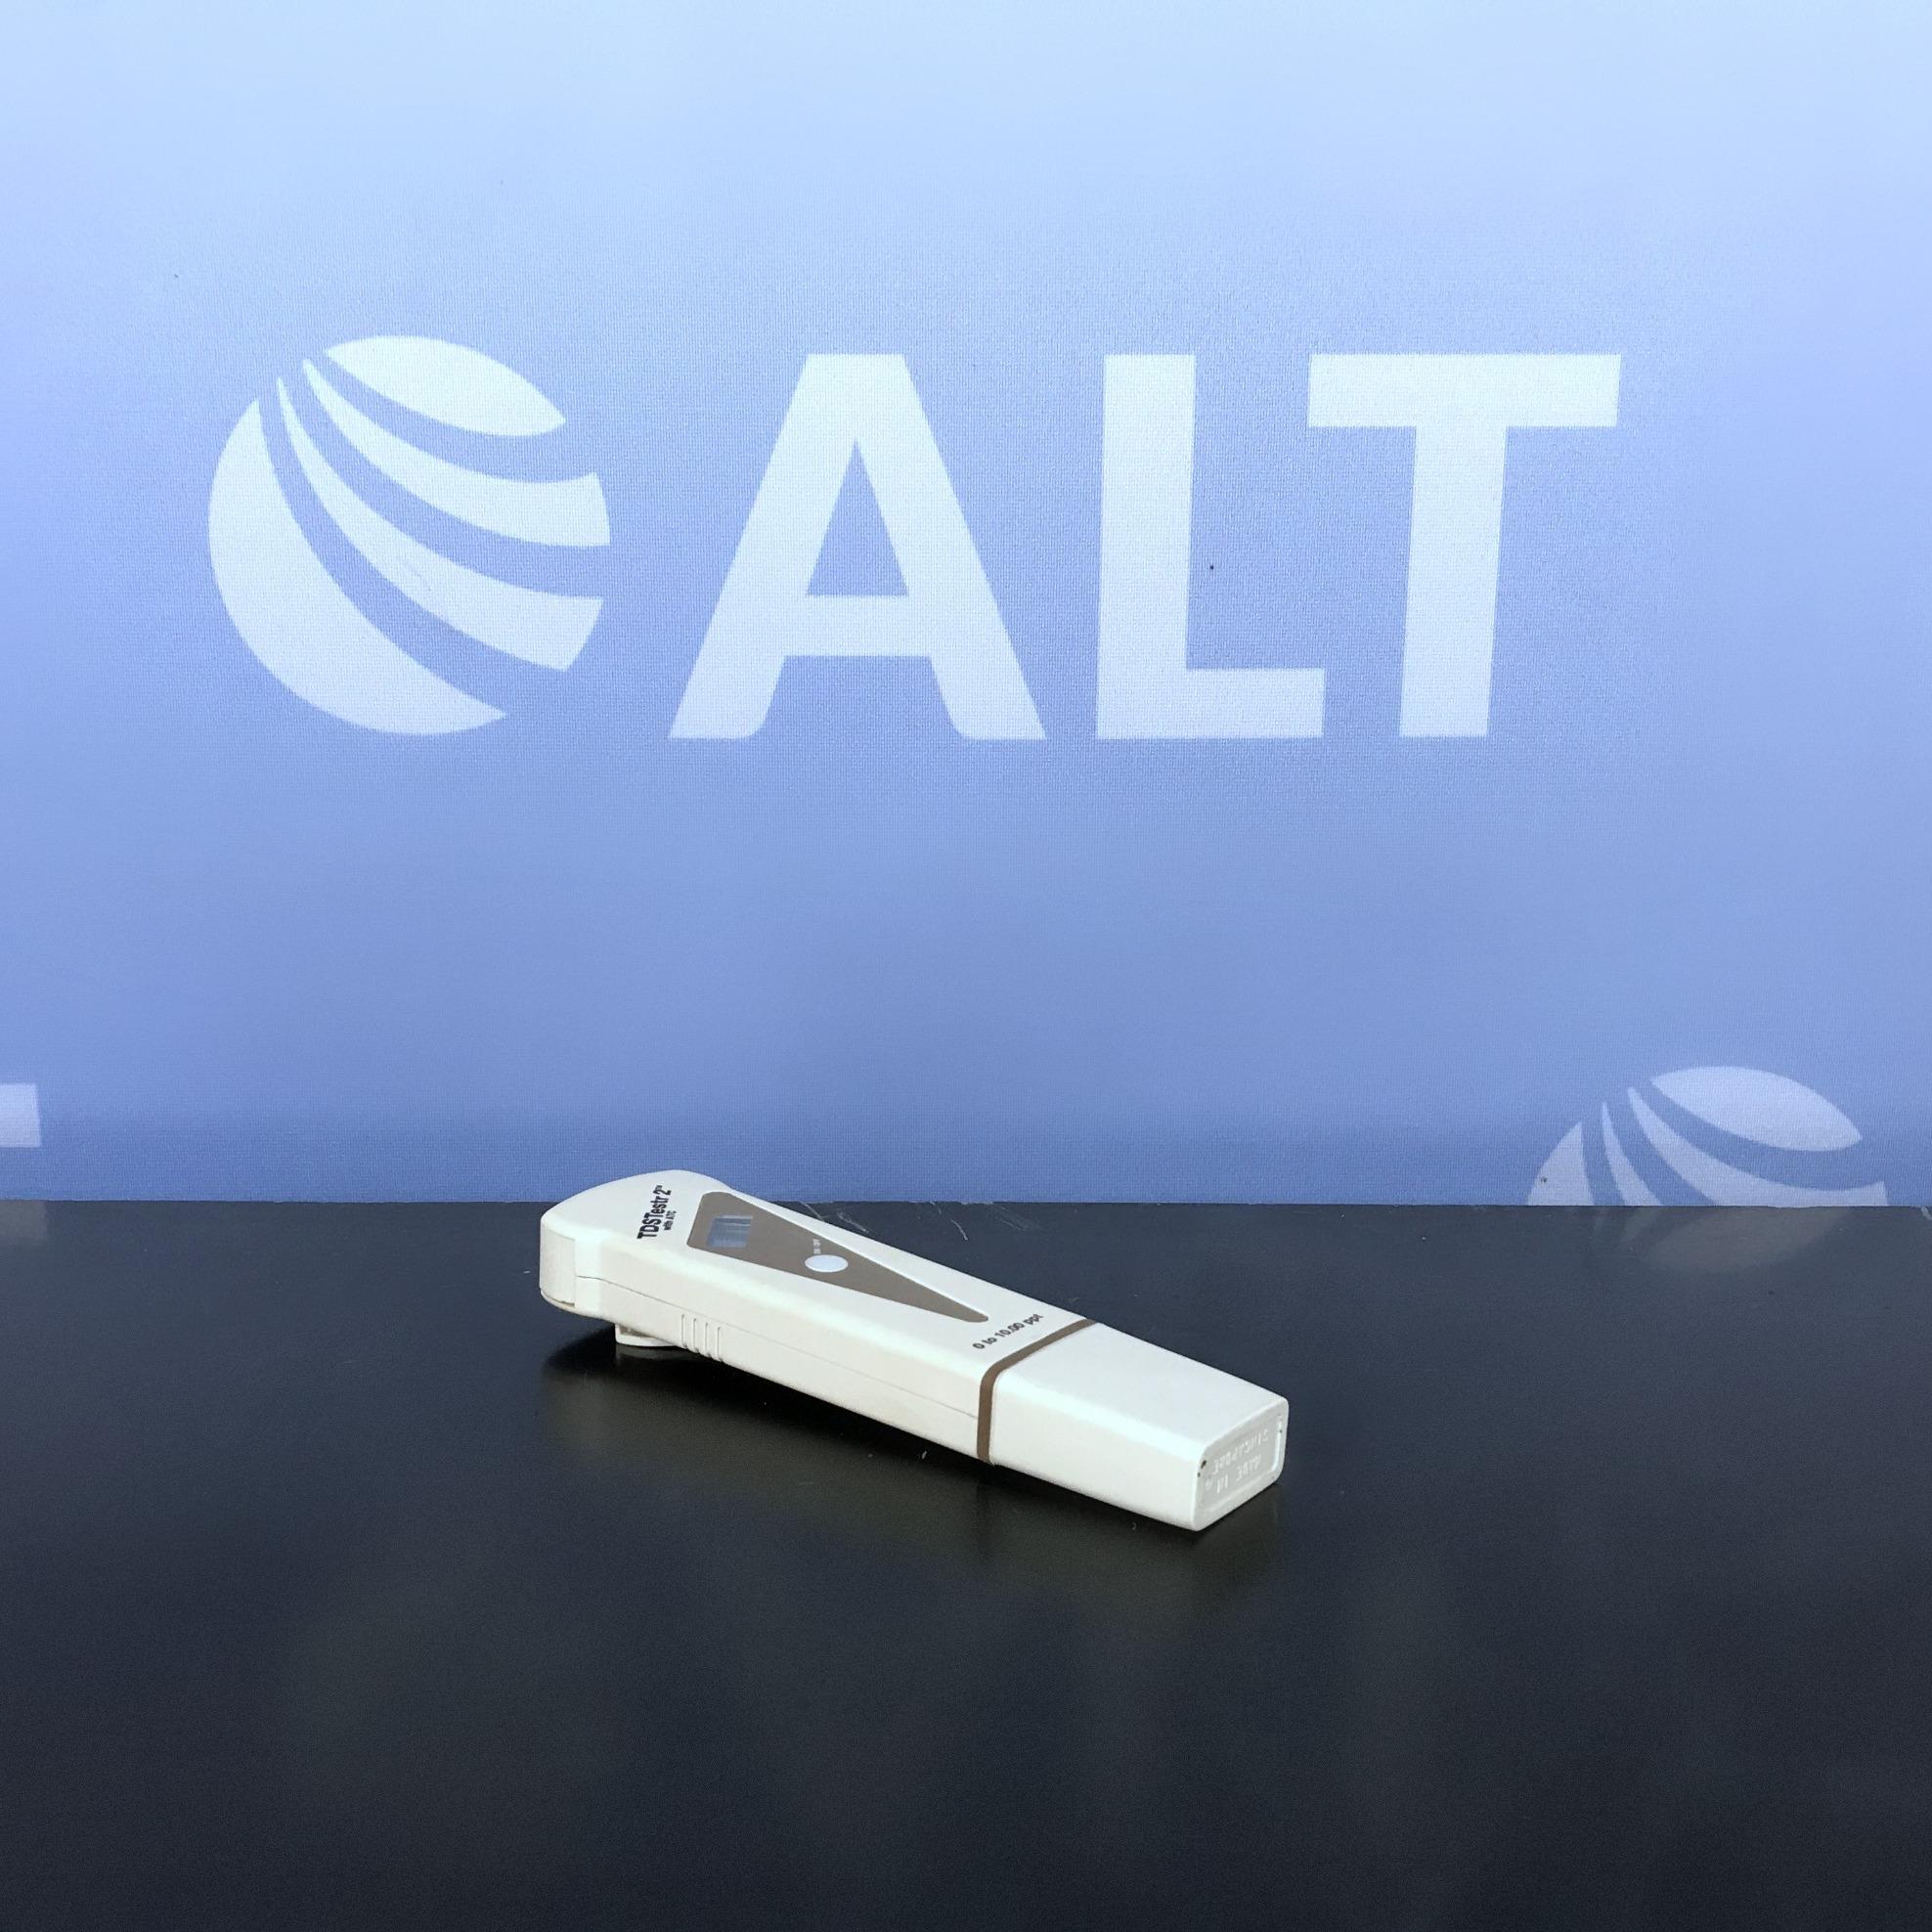 Oakton TDStestr 2 with ATC Image